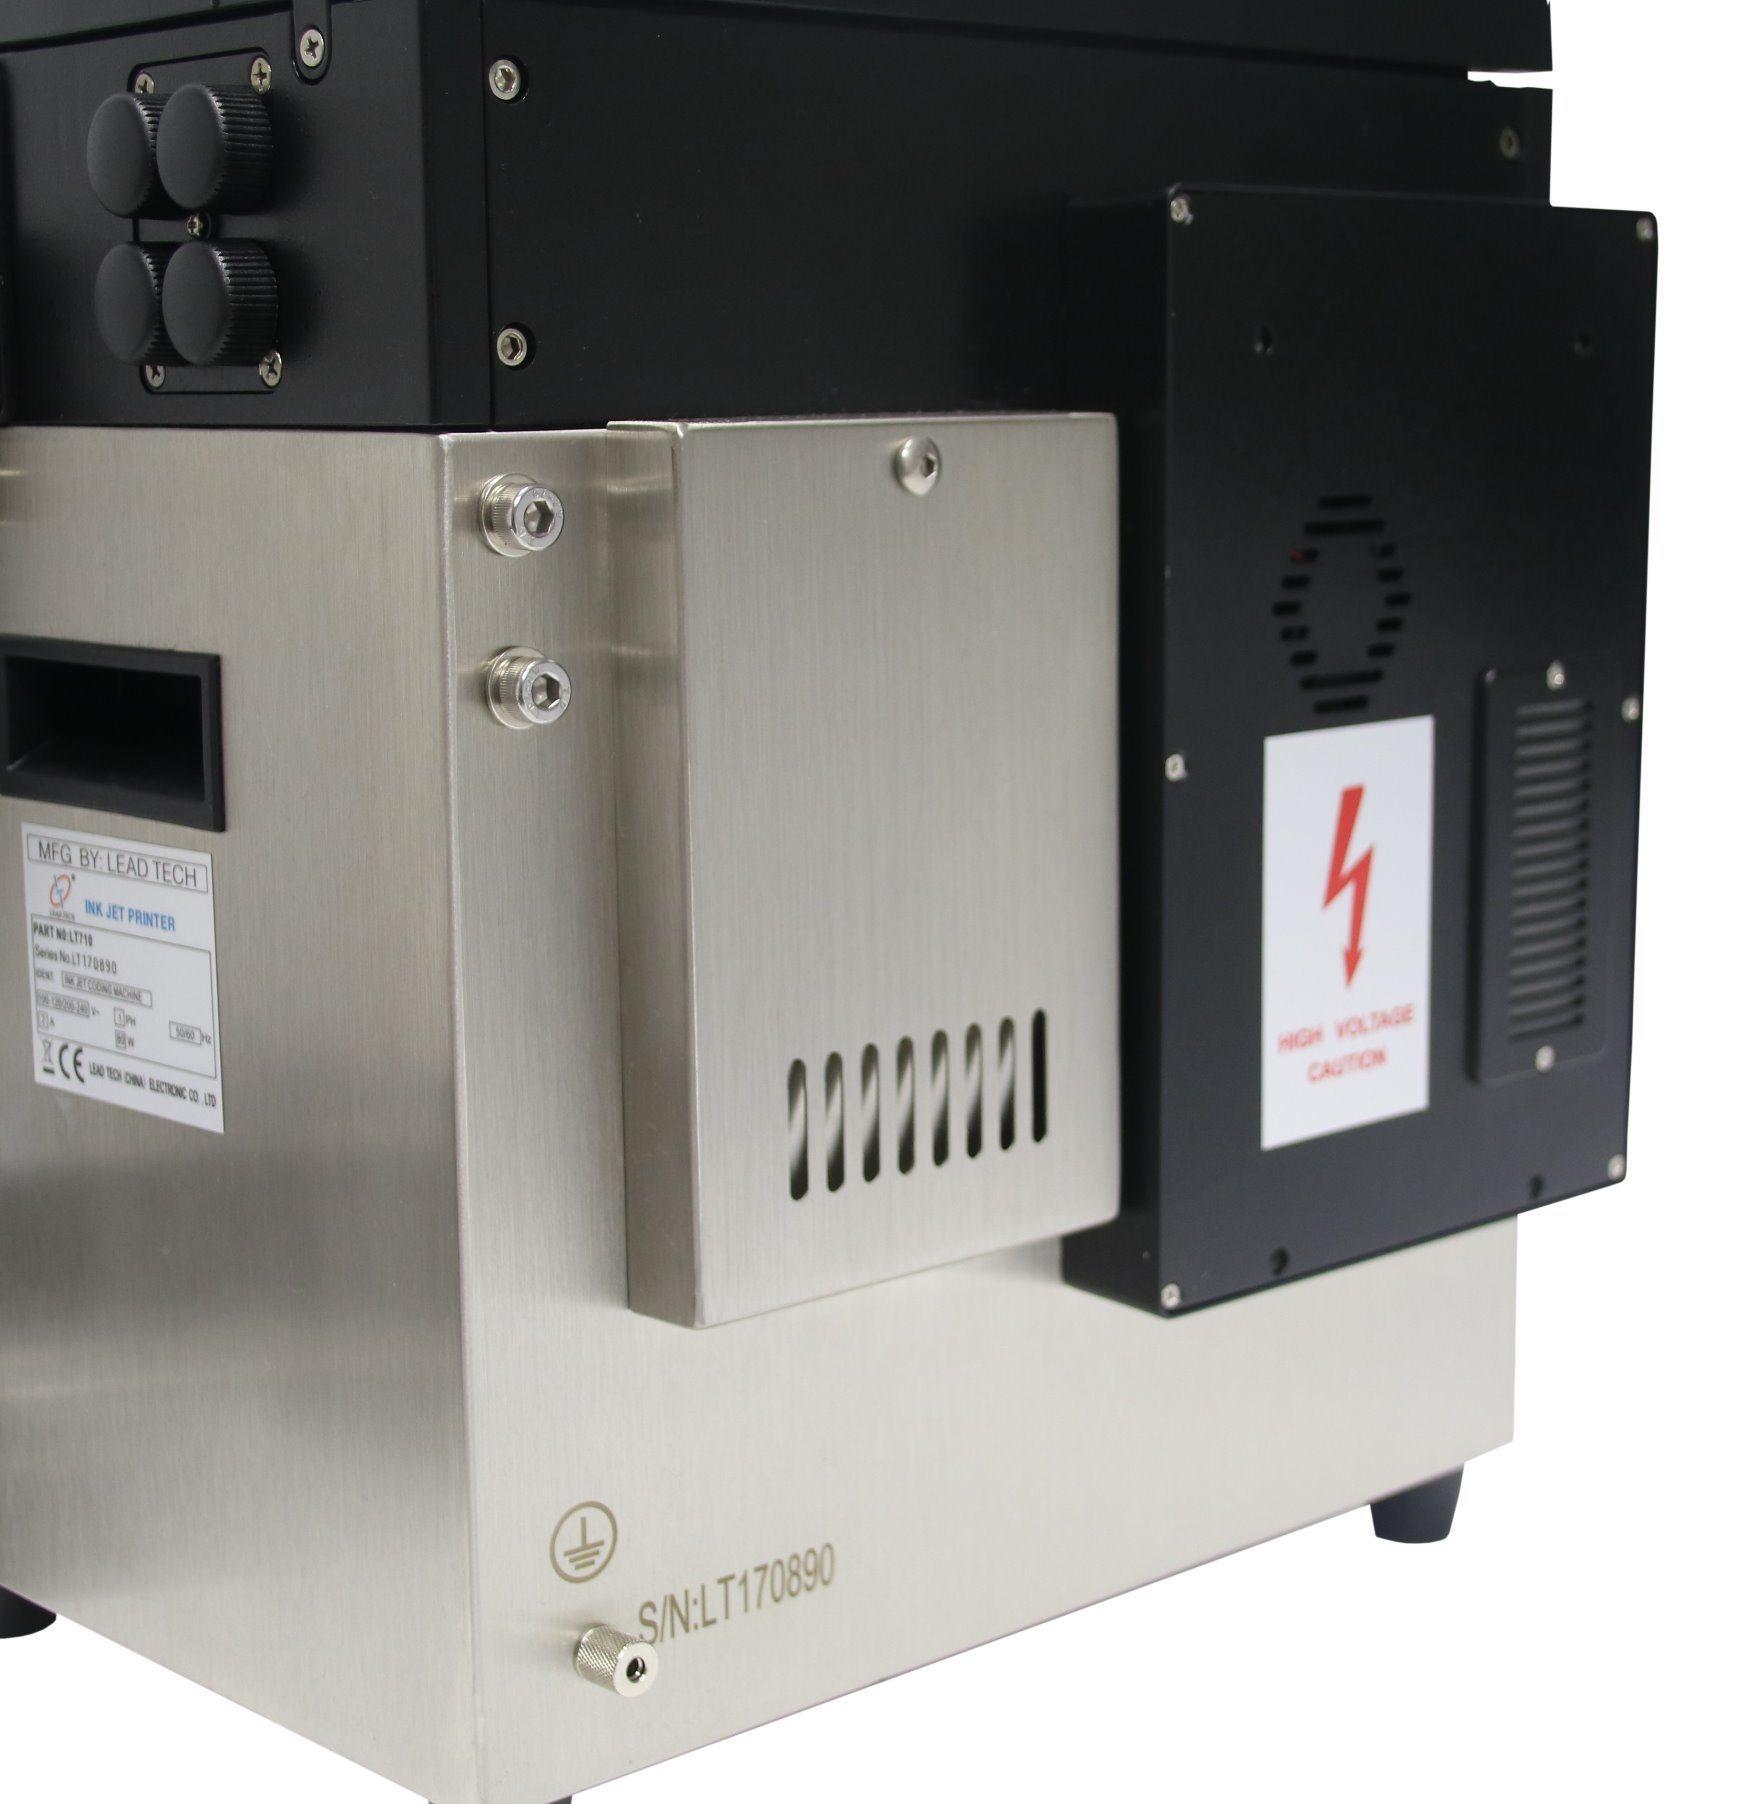 Lt760 Plastic Film Continuous Cij Inkjet Printer